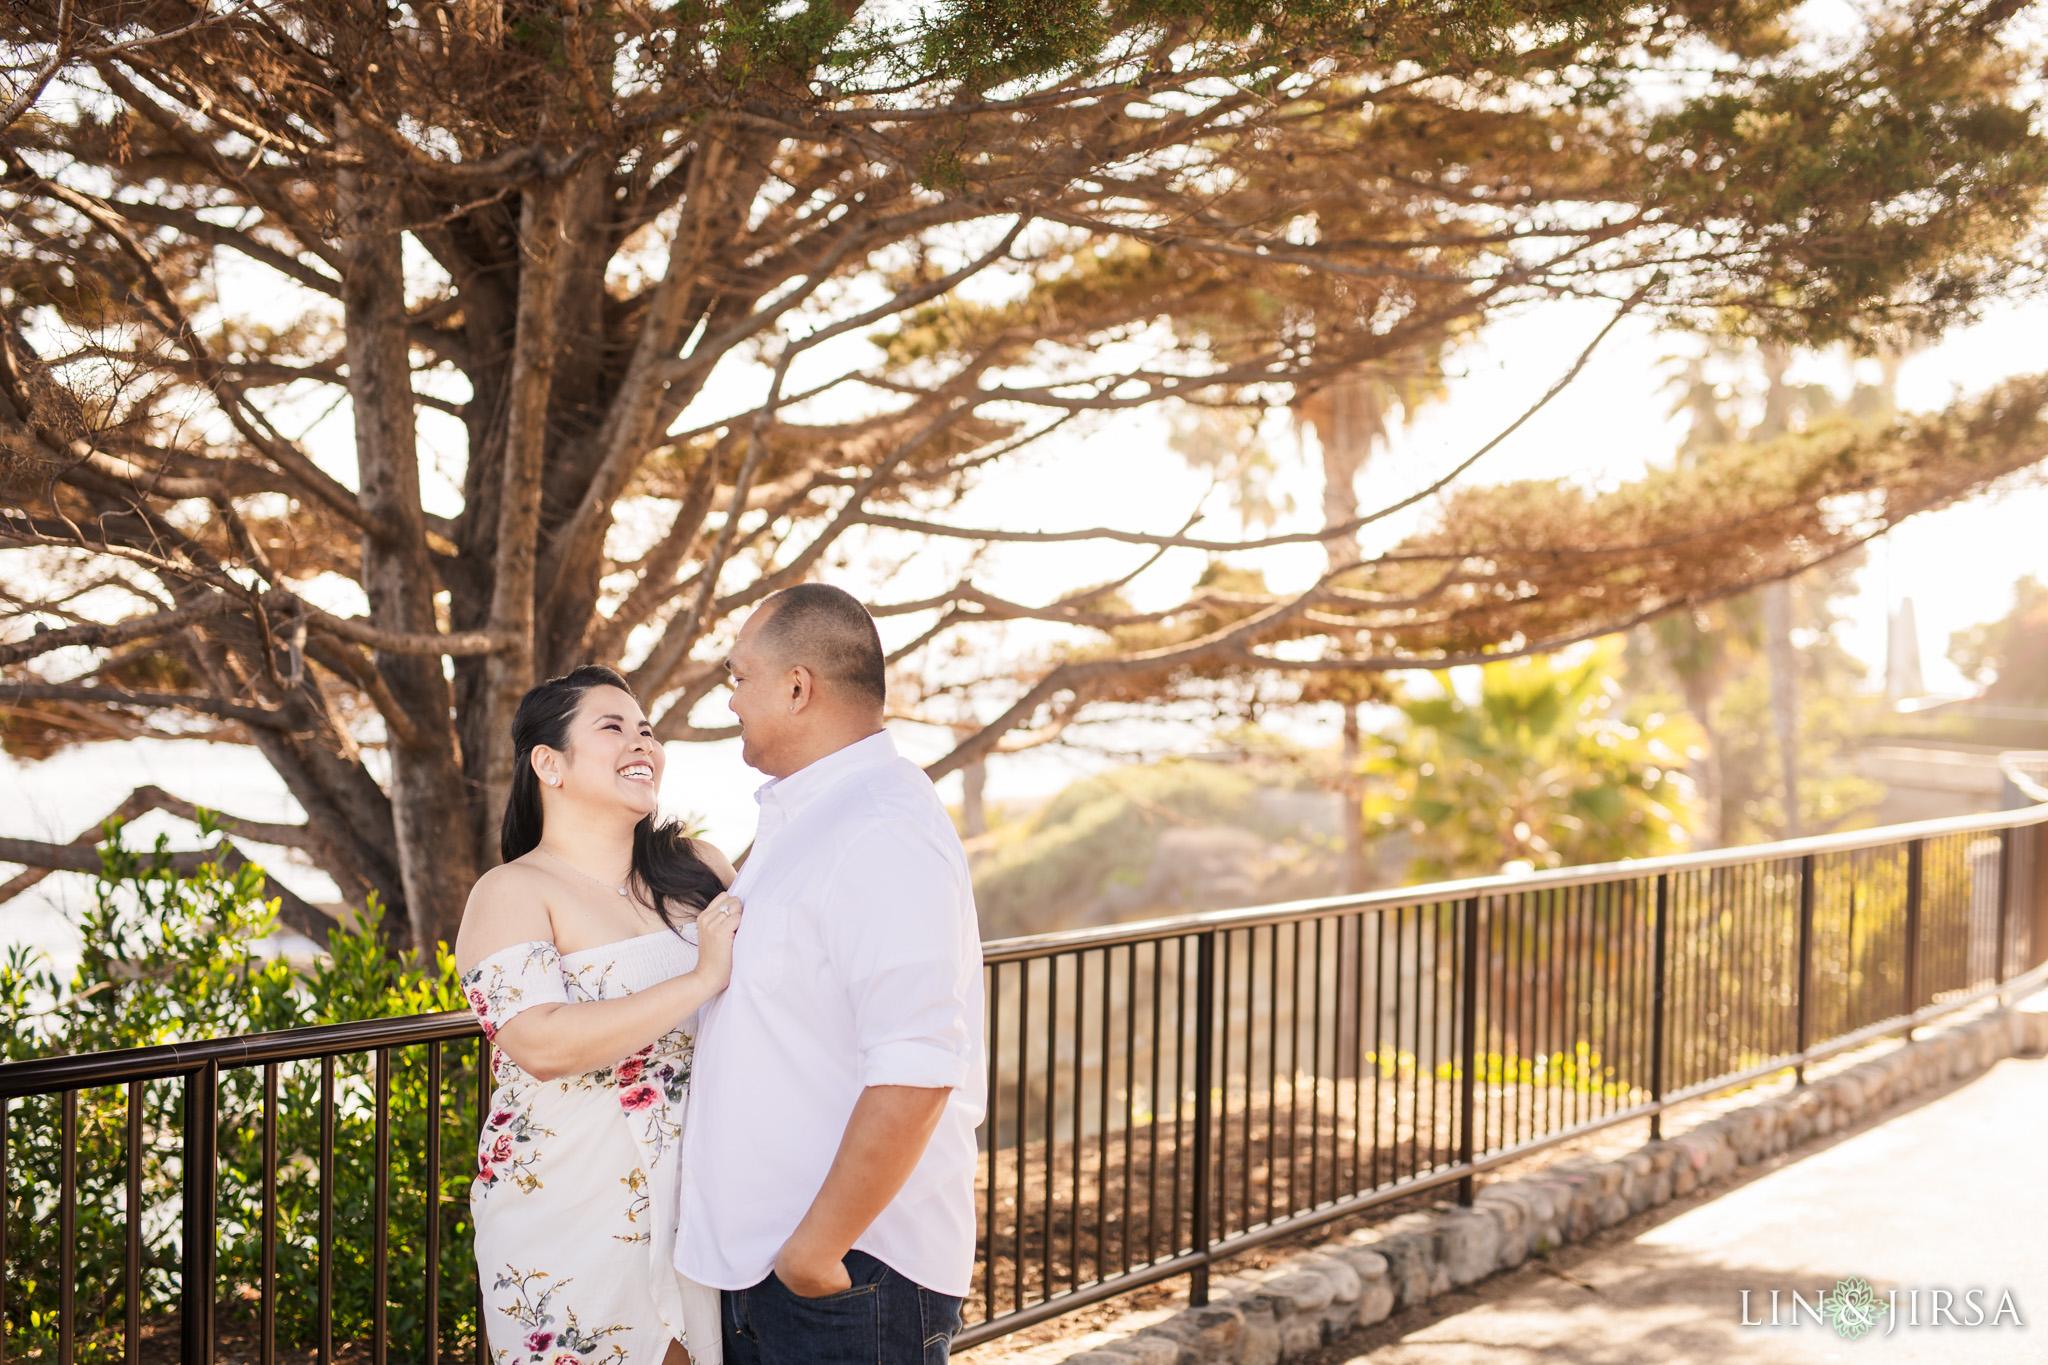 zls Heisler Park Orange County Engagement Photographer